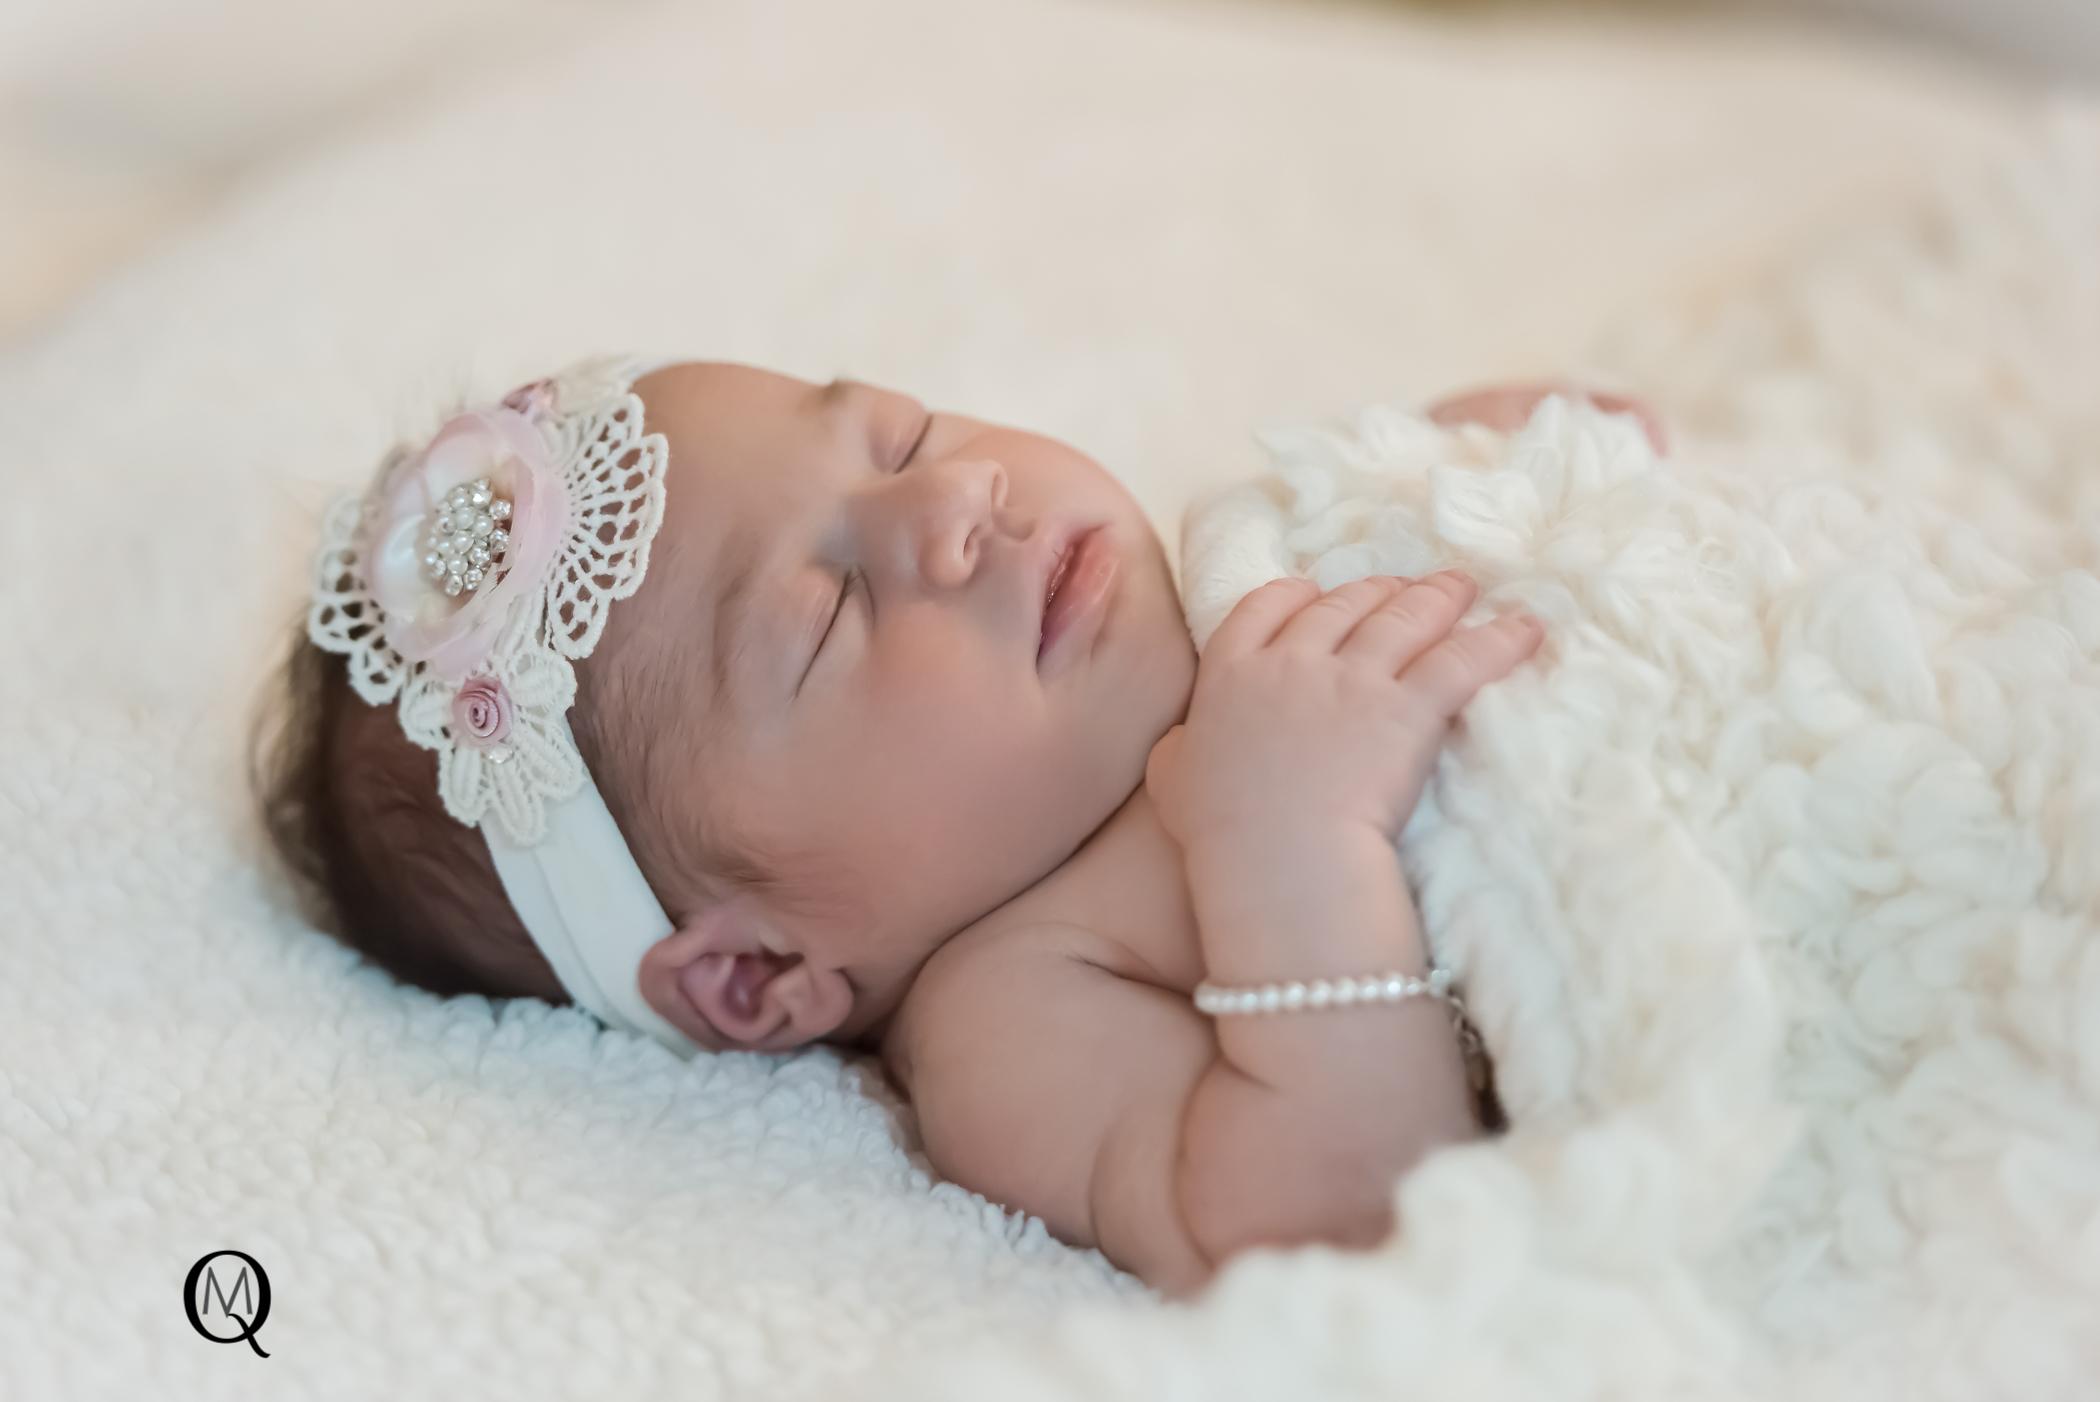 Newborn Photographer in Medford NJ